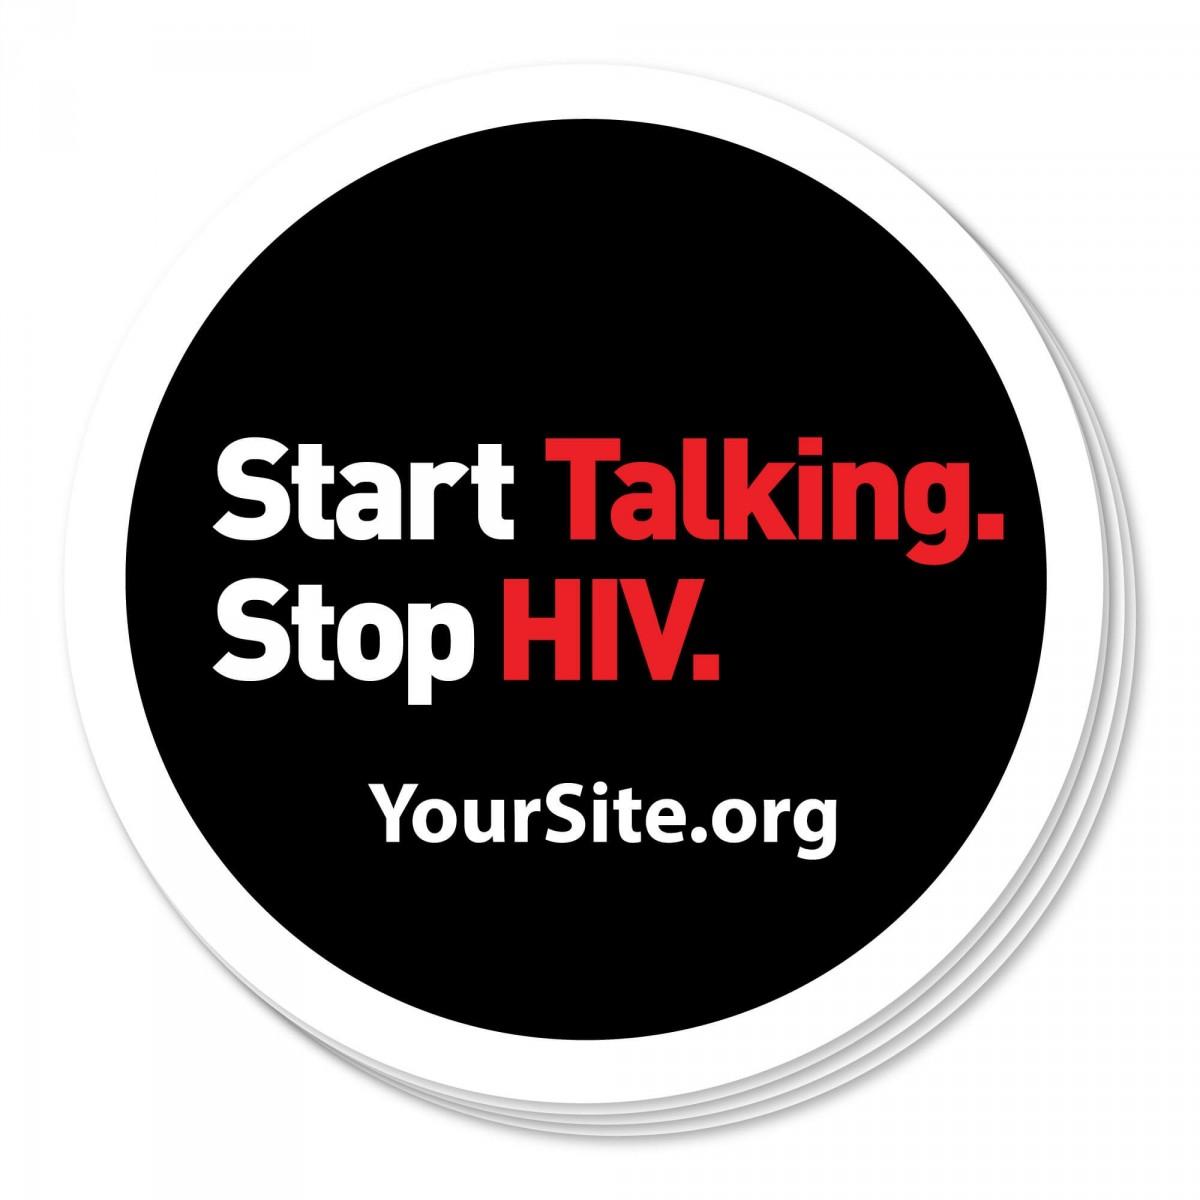 Start Talking Stop HIV Sticker